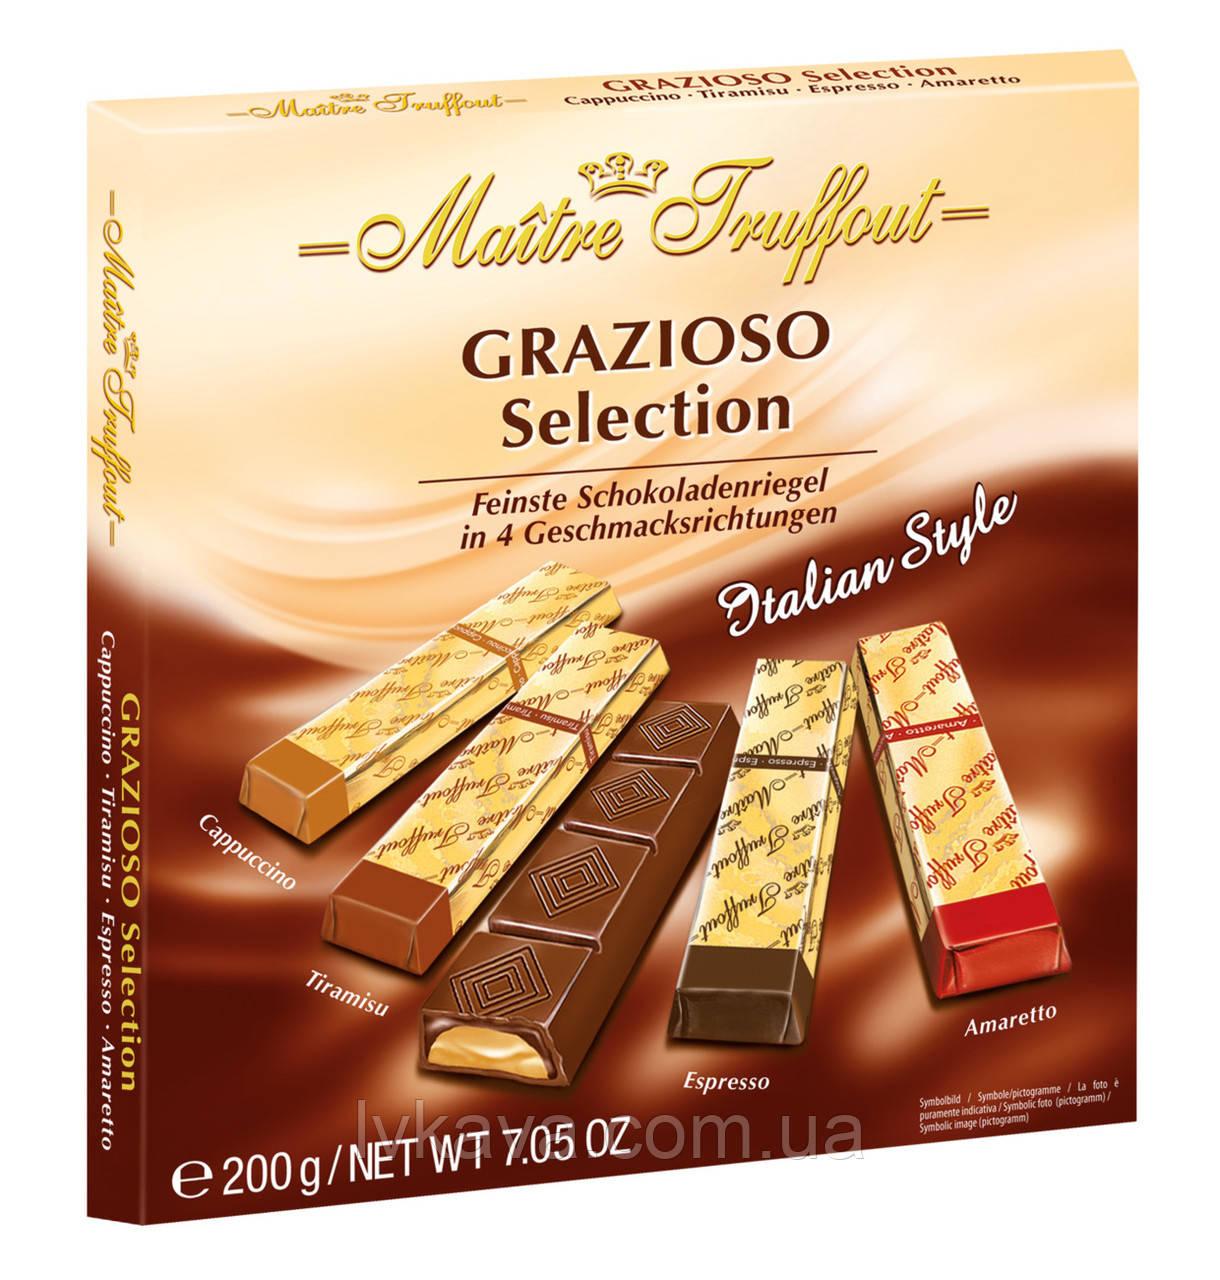 Черный и молочный  шоколад Grazioso Selection Italian style  Maitre Truffout  , 200 гр